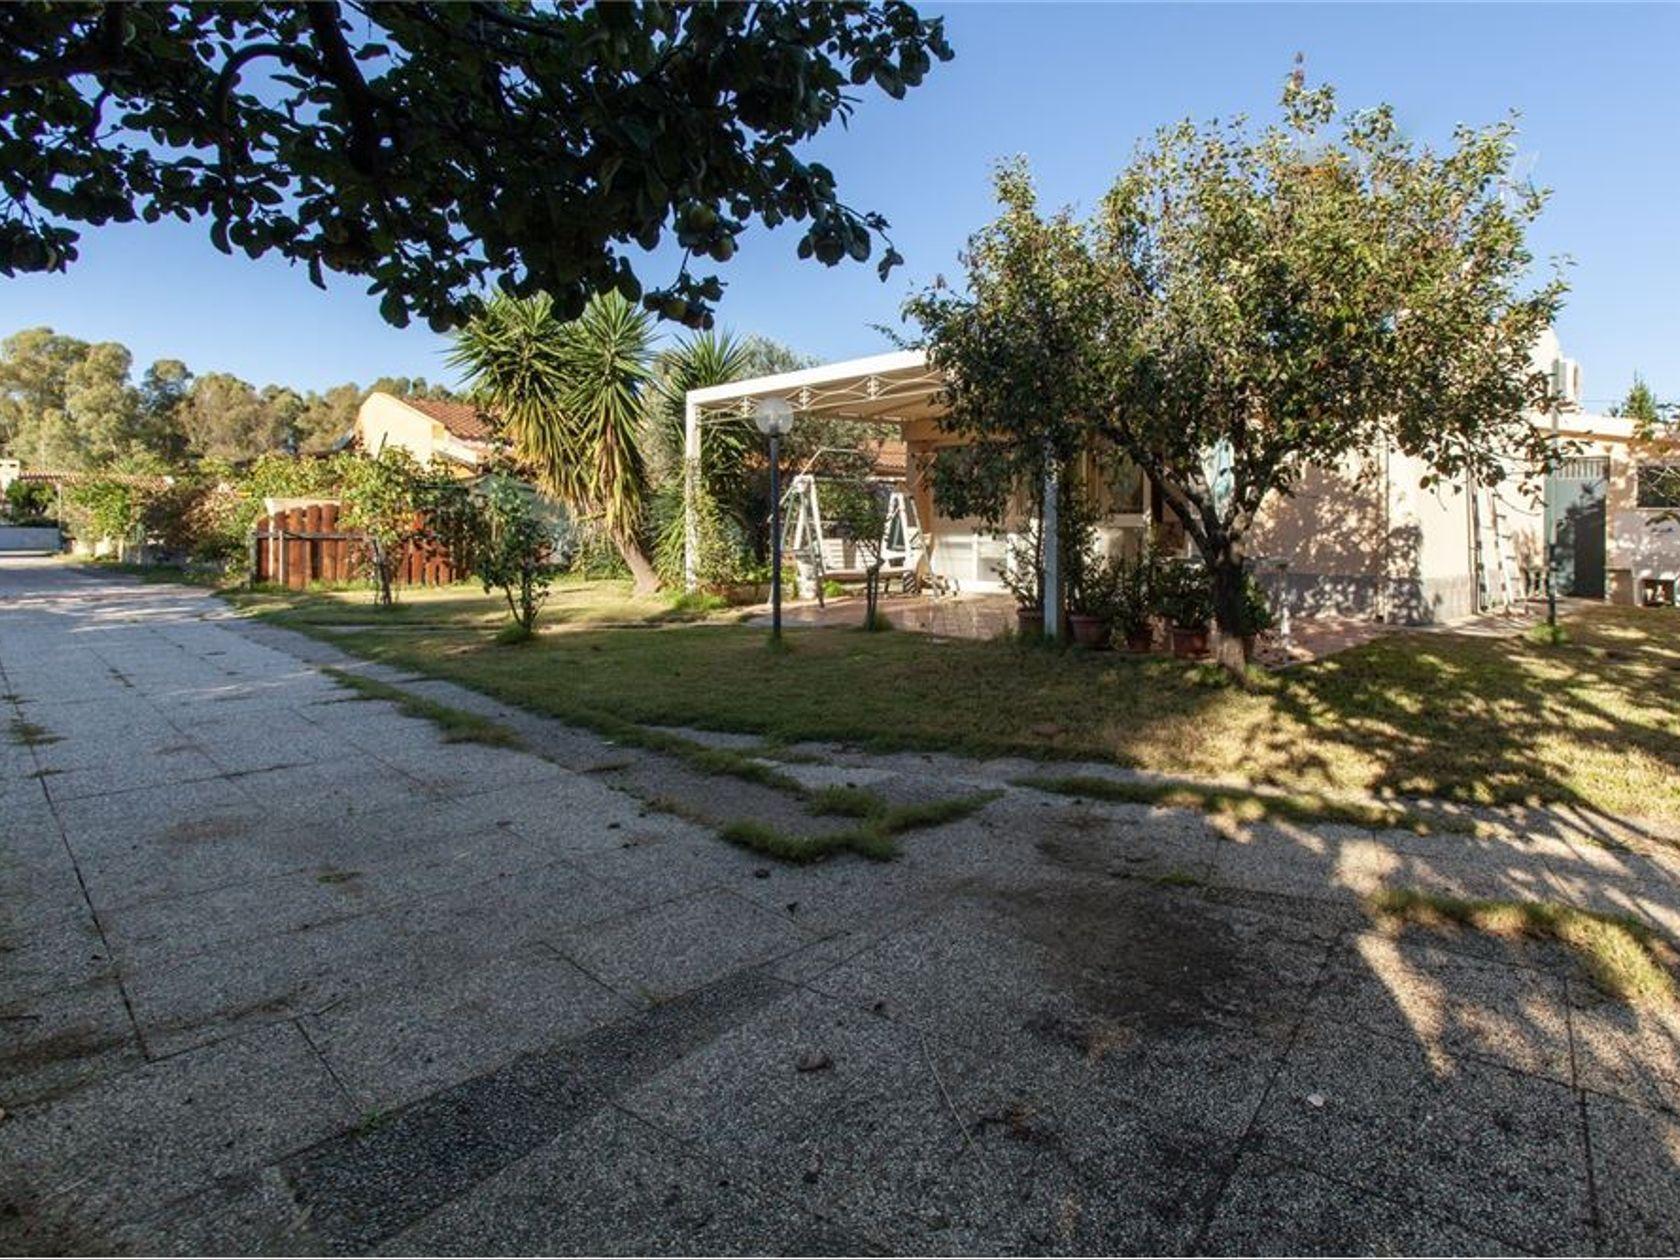 Villa singola Geremeas, Maracalagonis, CA Vendita - Foto 6